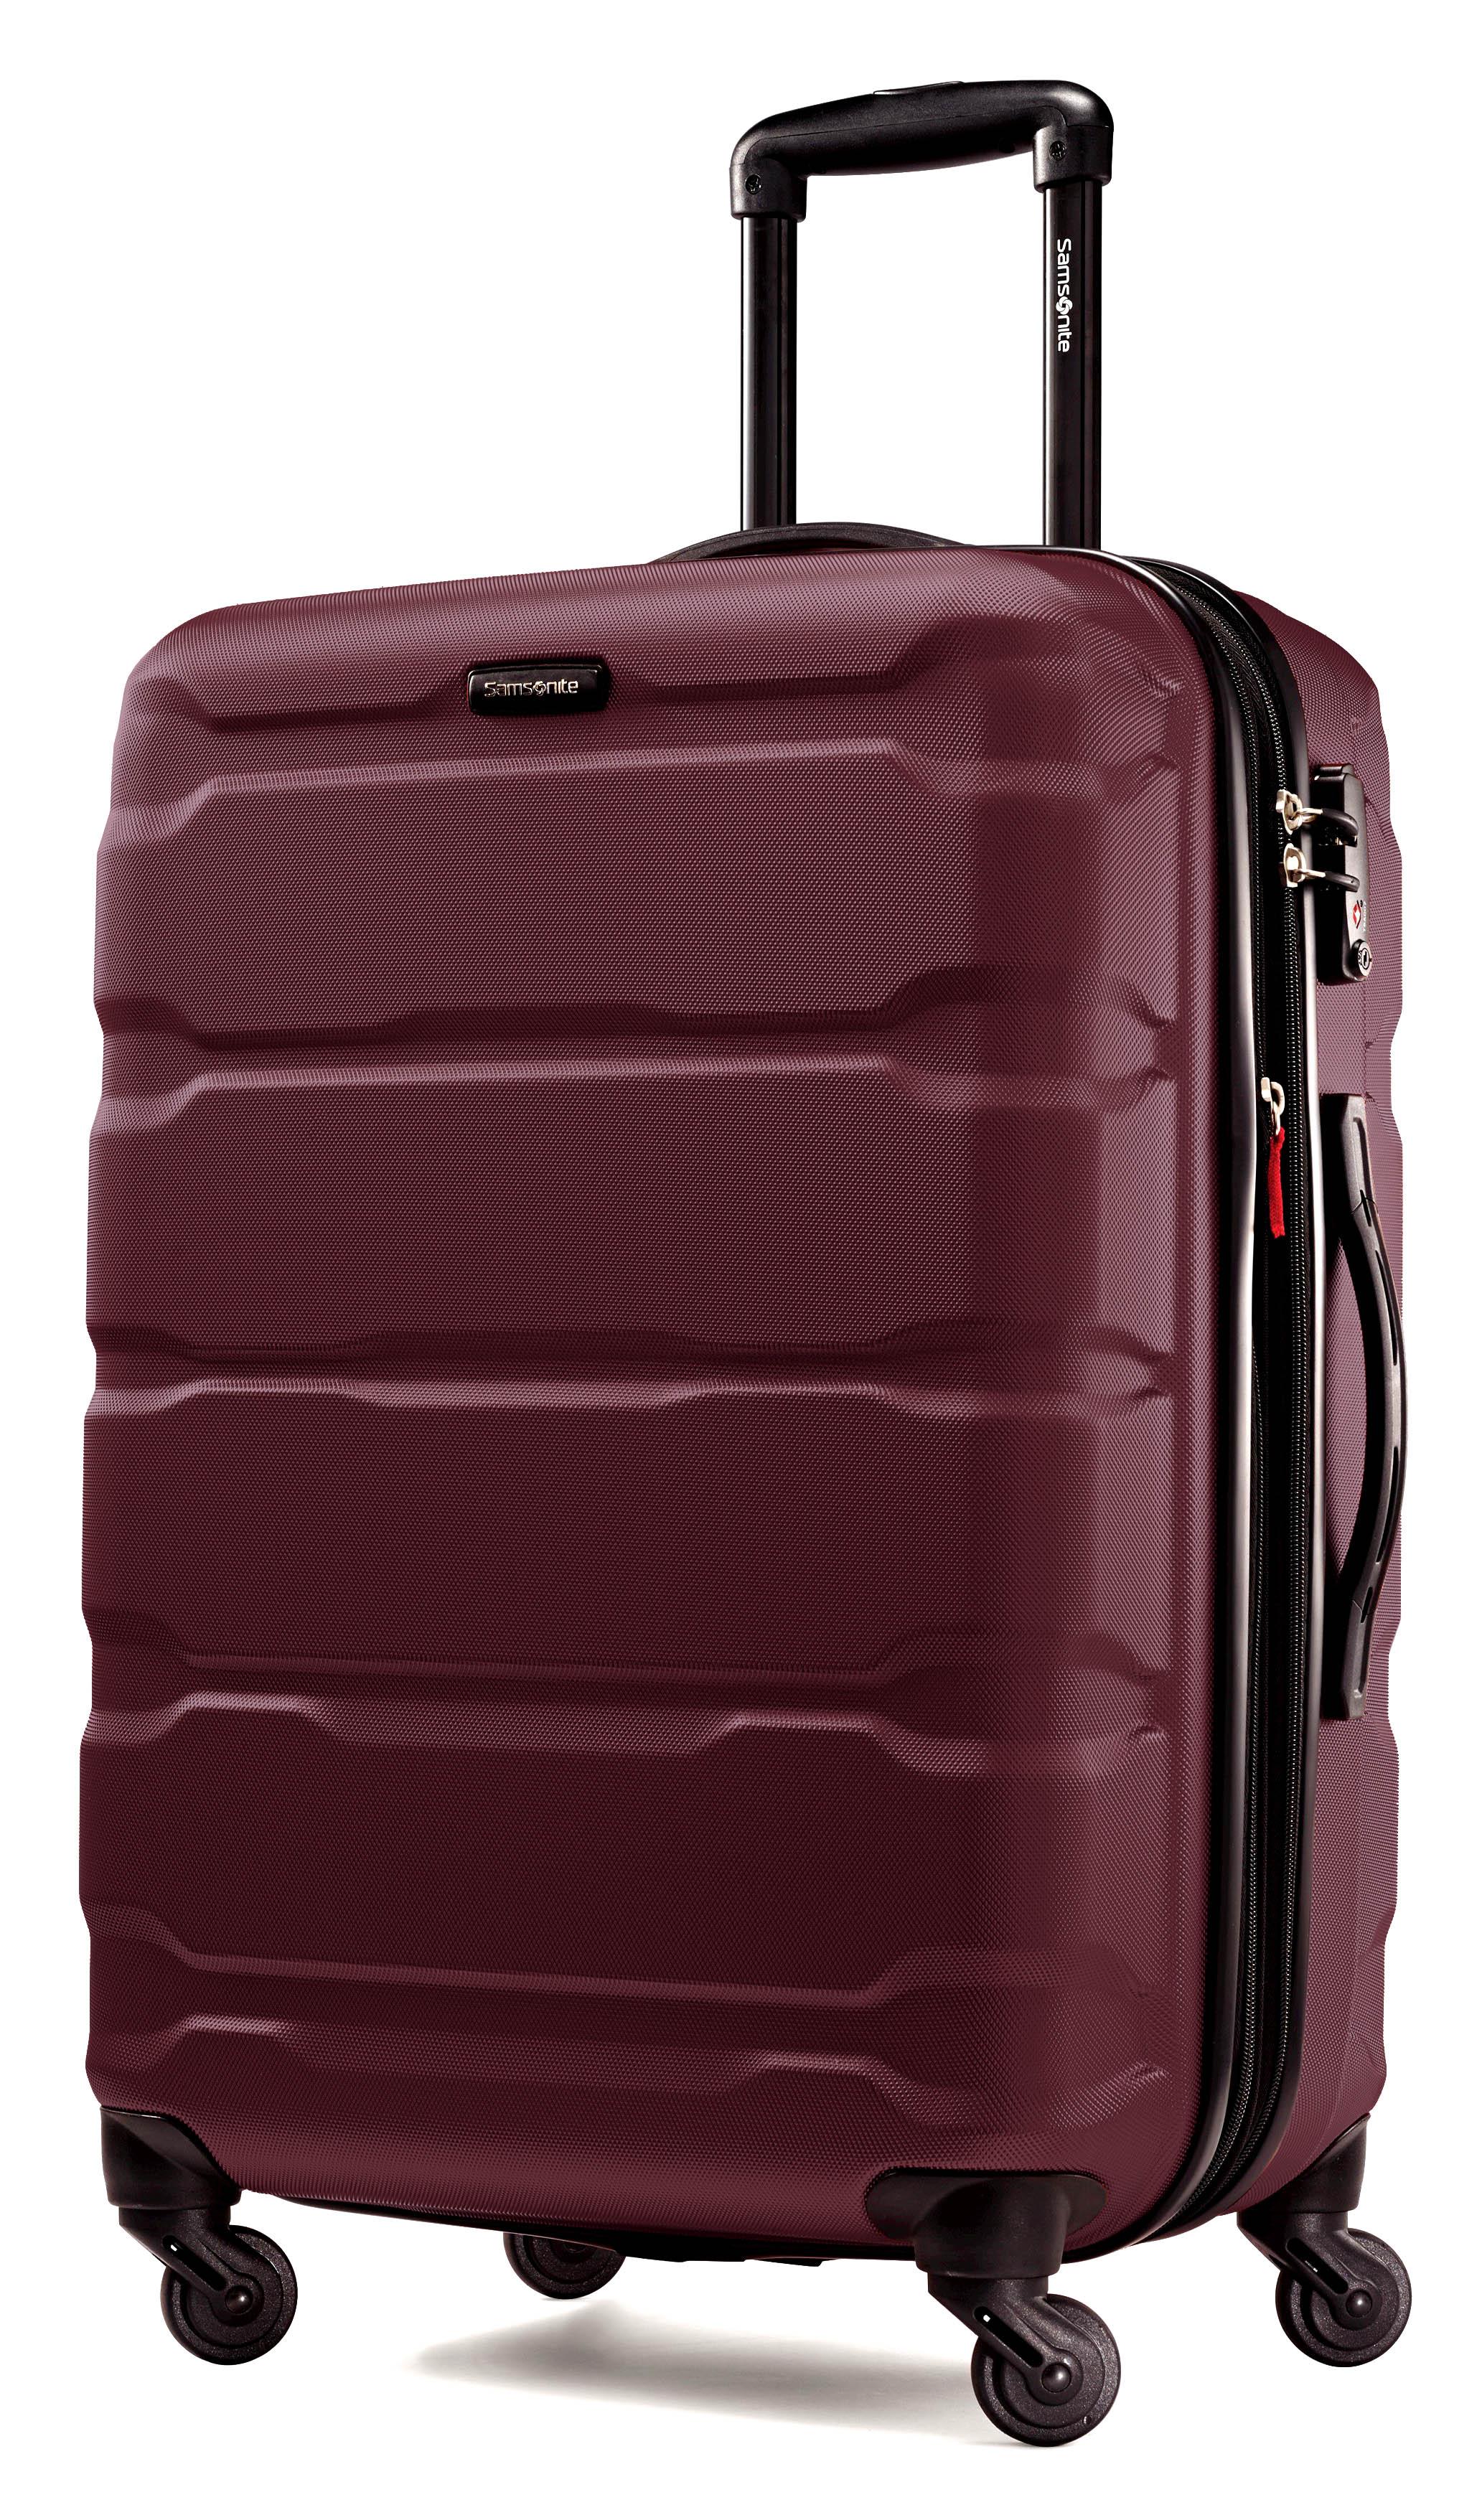 how to set samsonite luggage lock